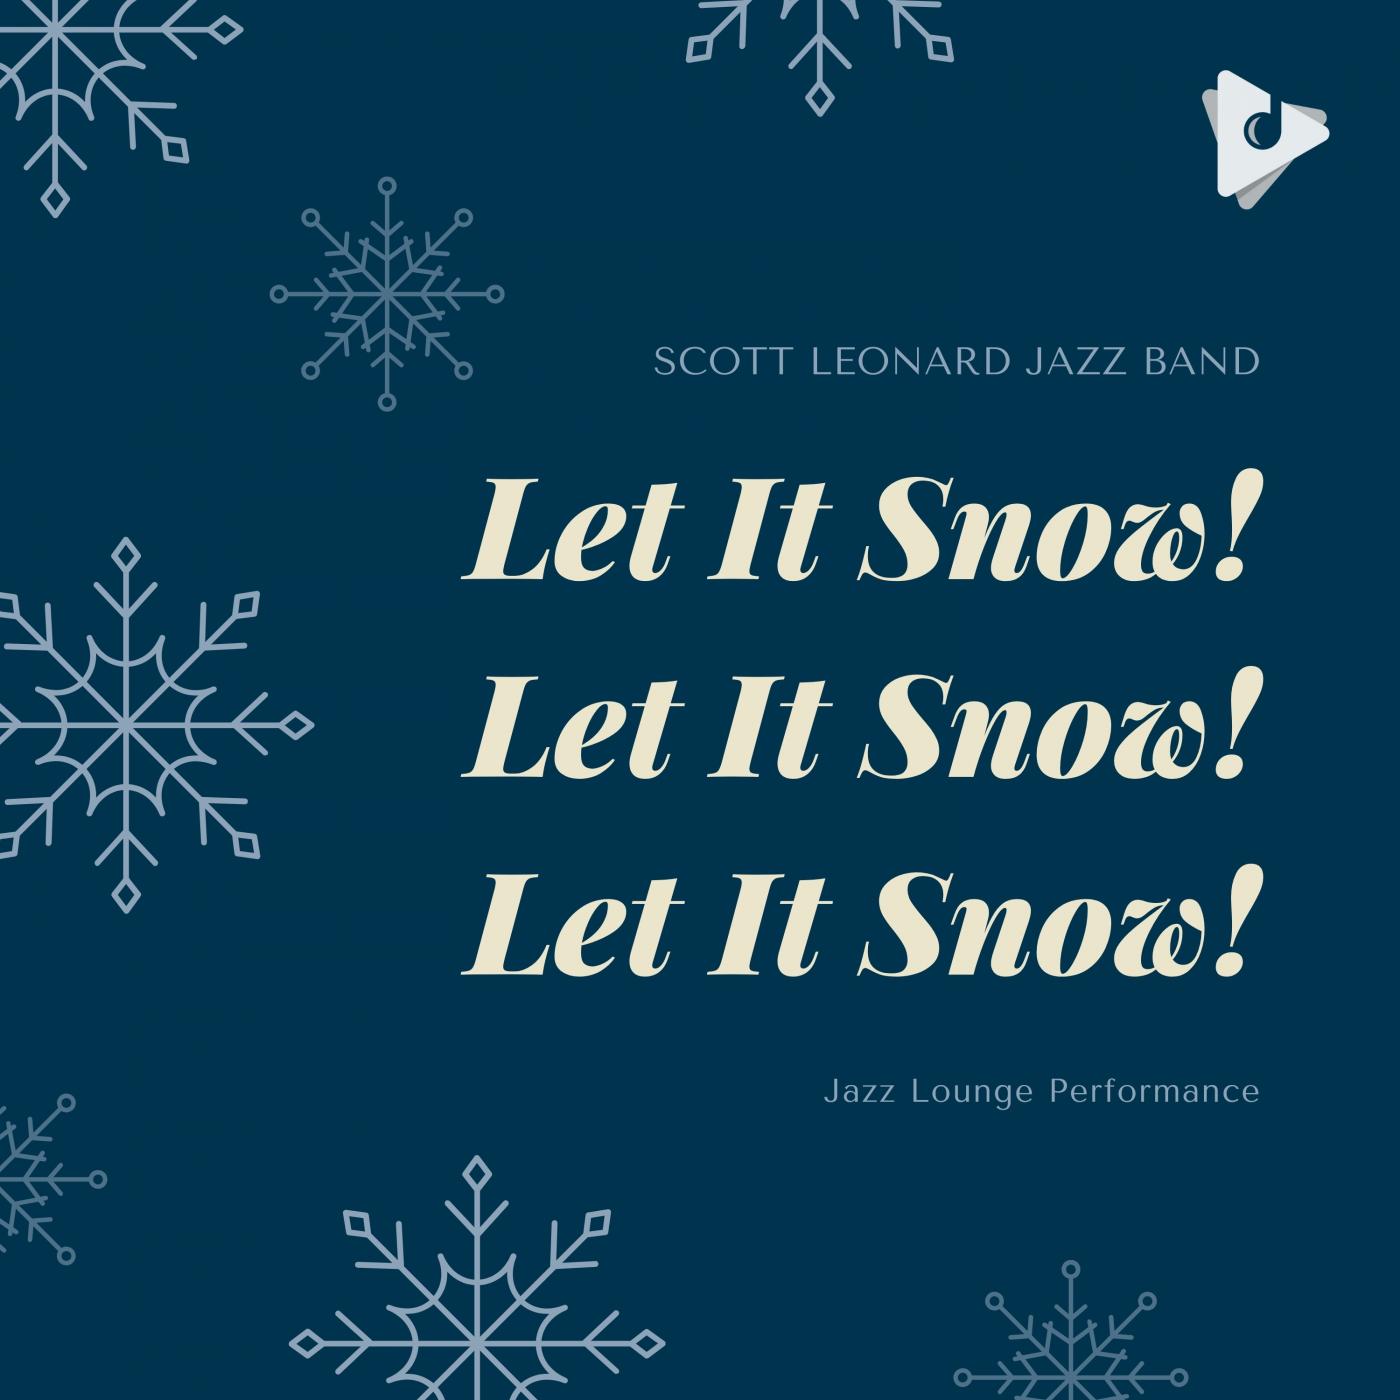 Let It Snow! Let It Snow! Let It Snow! (Jazz Performance)